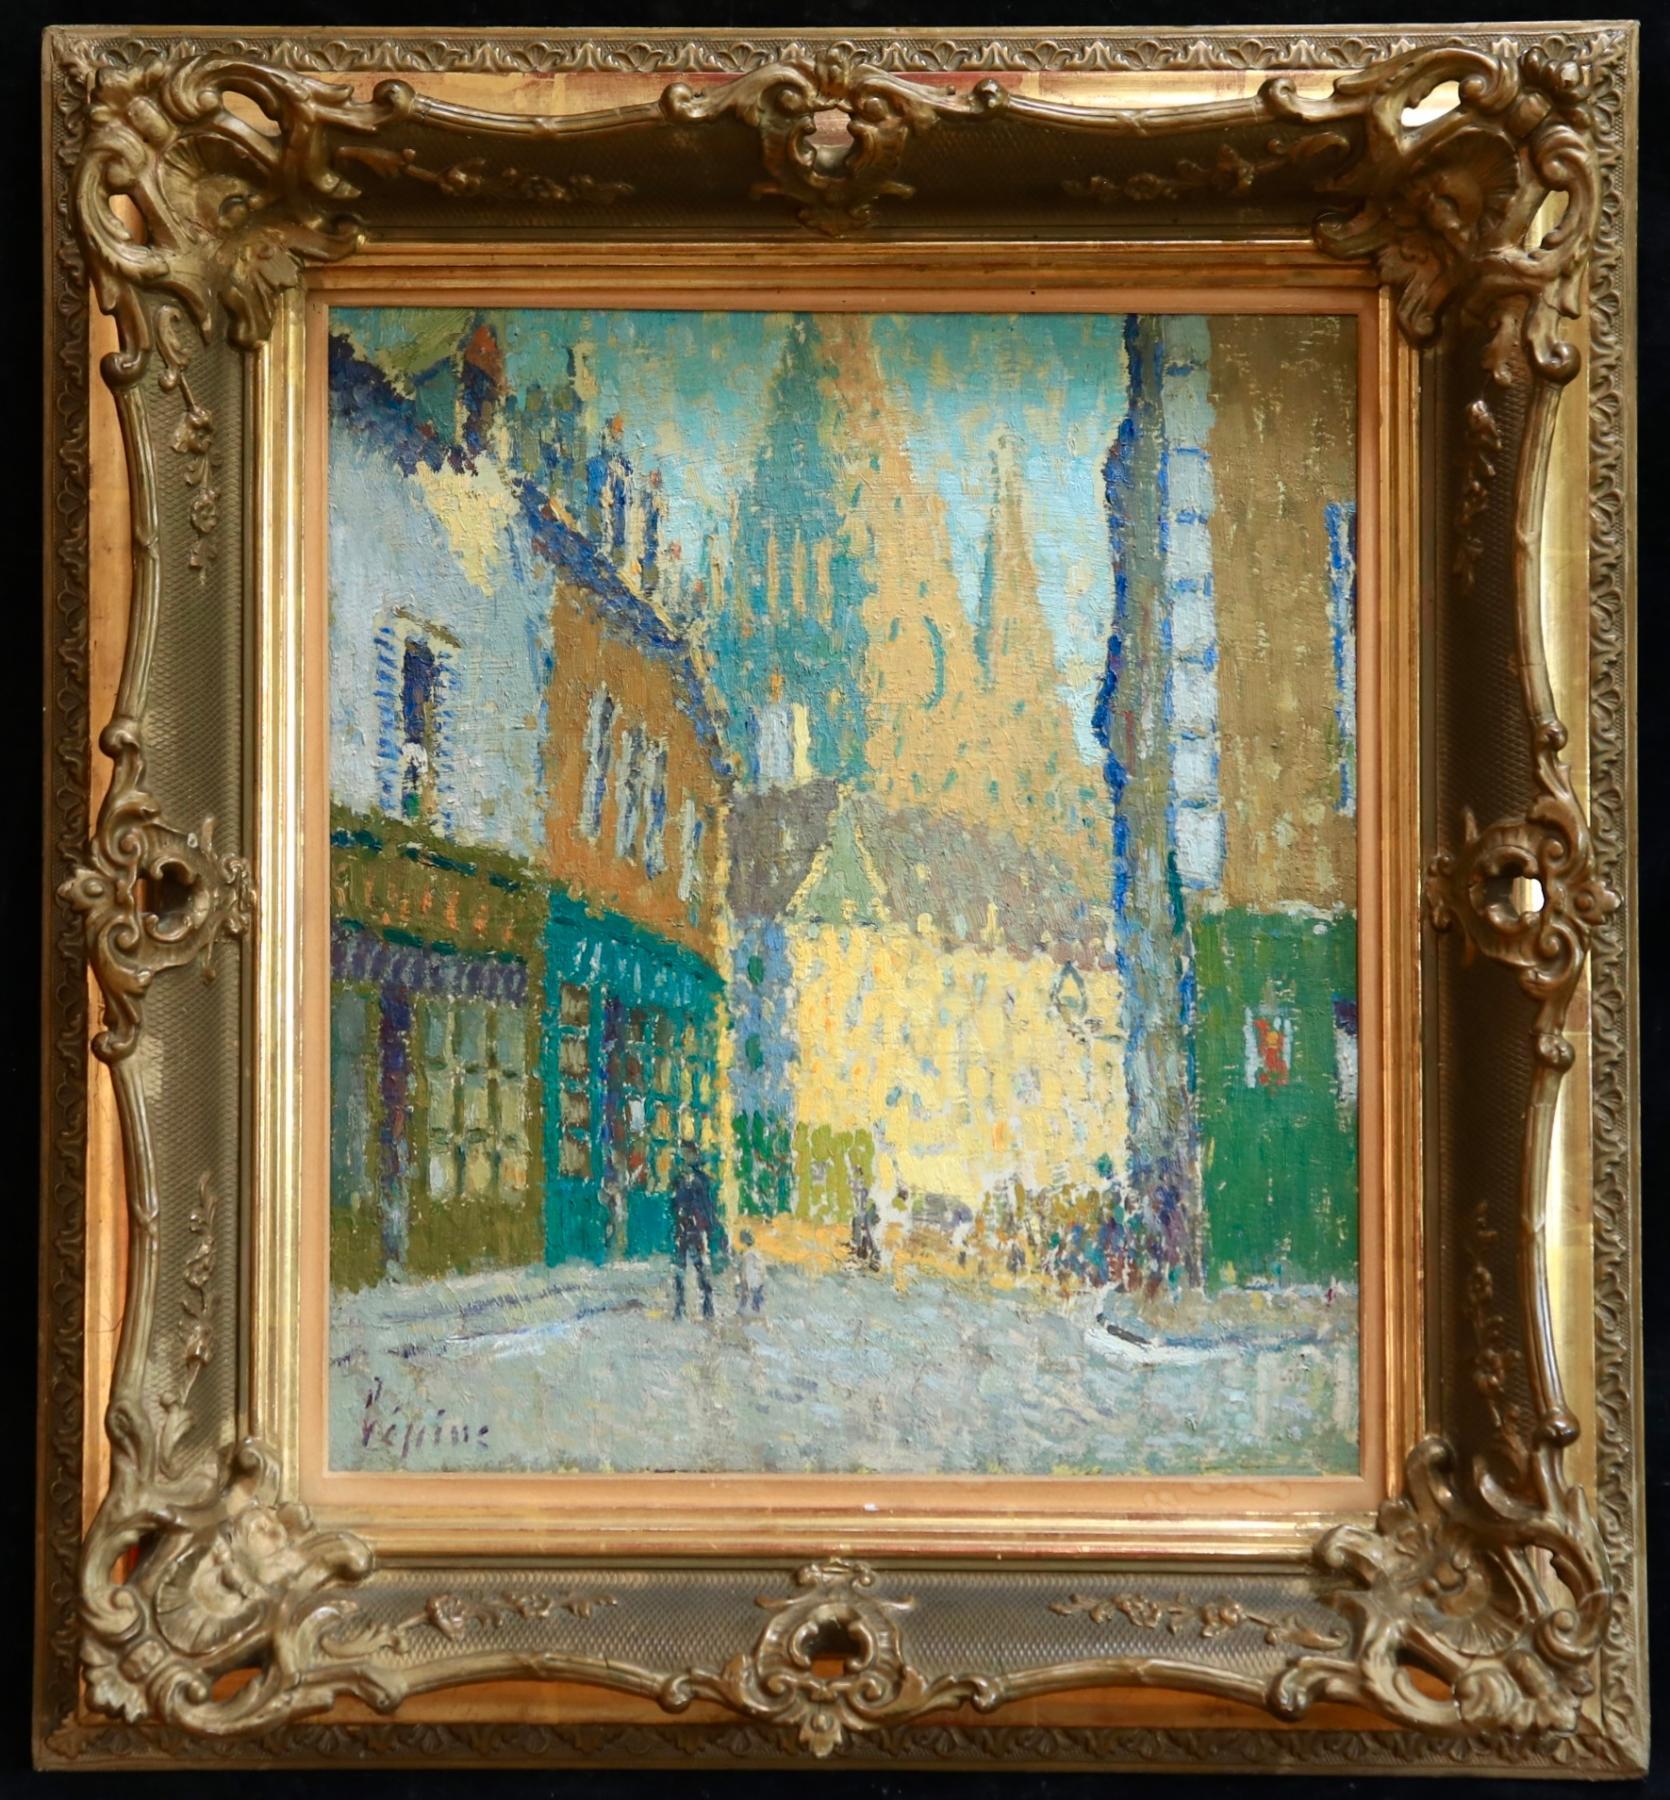 Rue de Vannes - Brittany - Pointillist Oil, Figures in Landscape by J L F Lepine